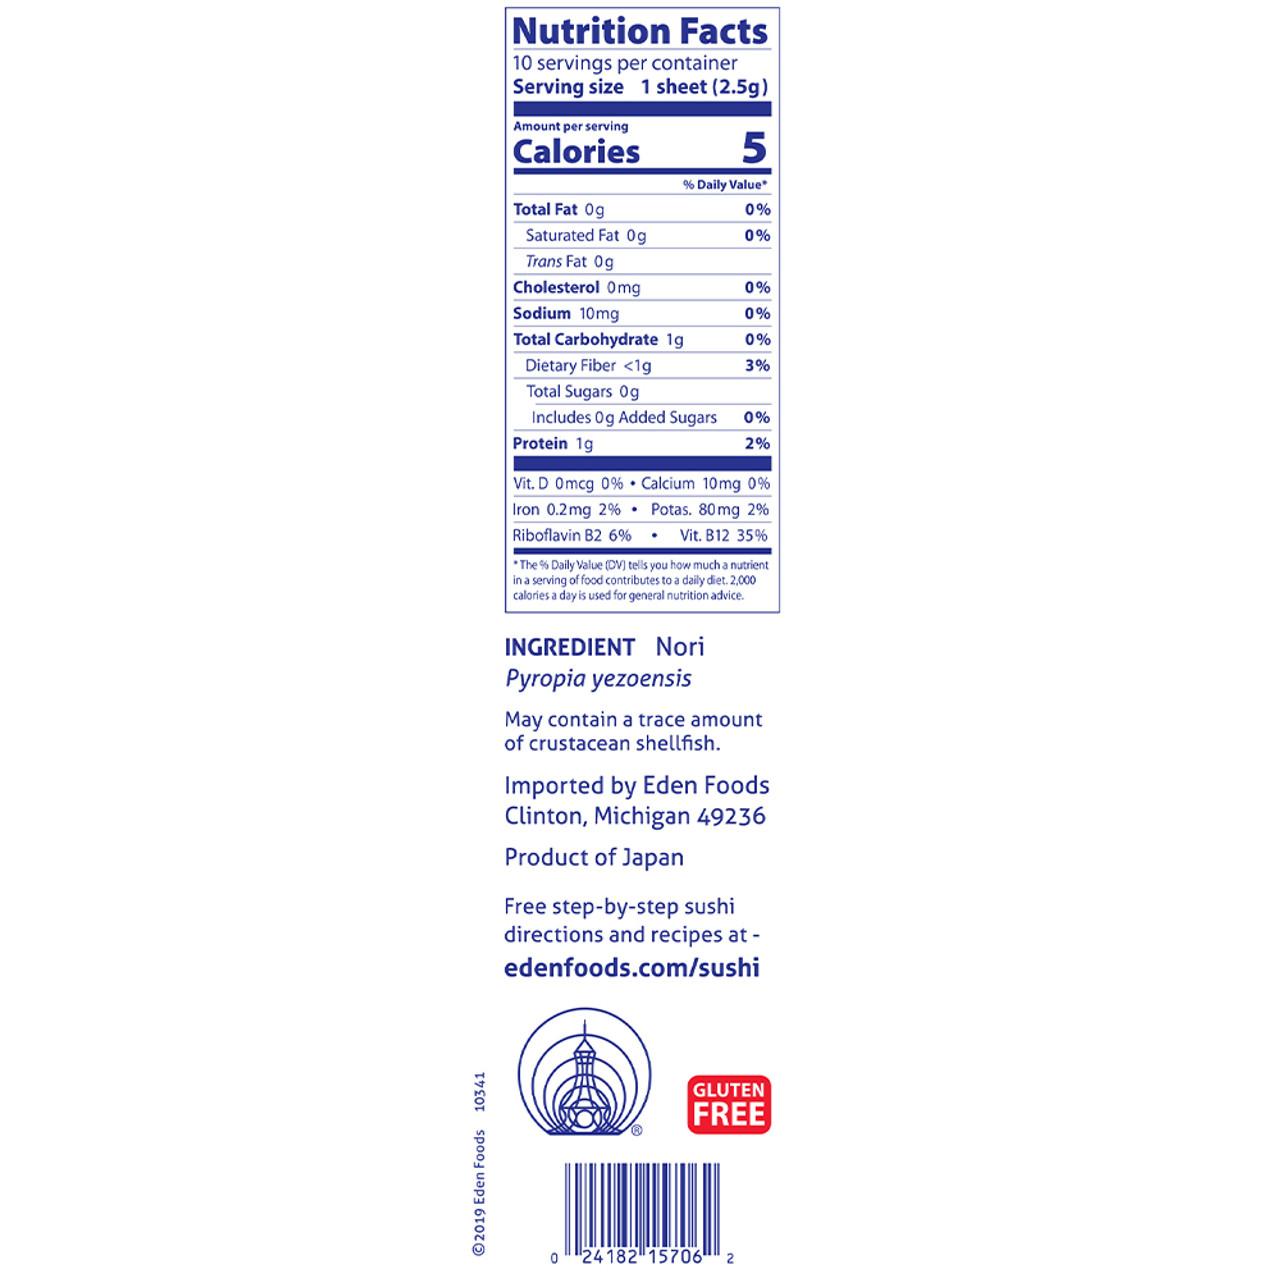 Nori, Sea Vegetable, 10 untoasted sheets